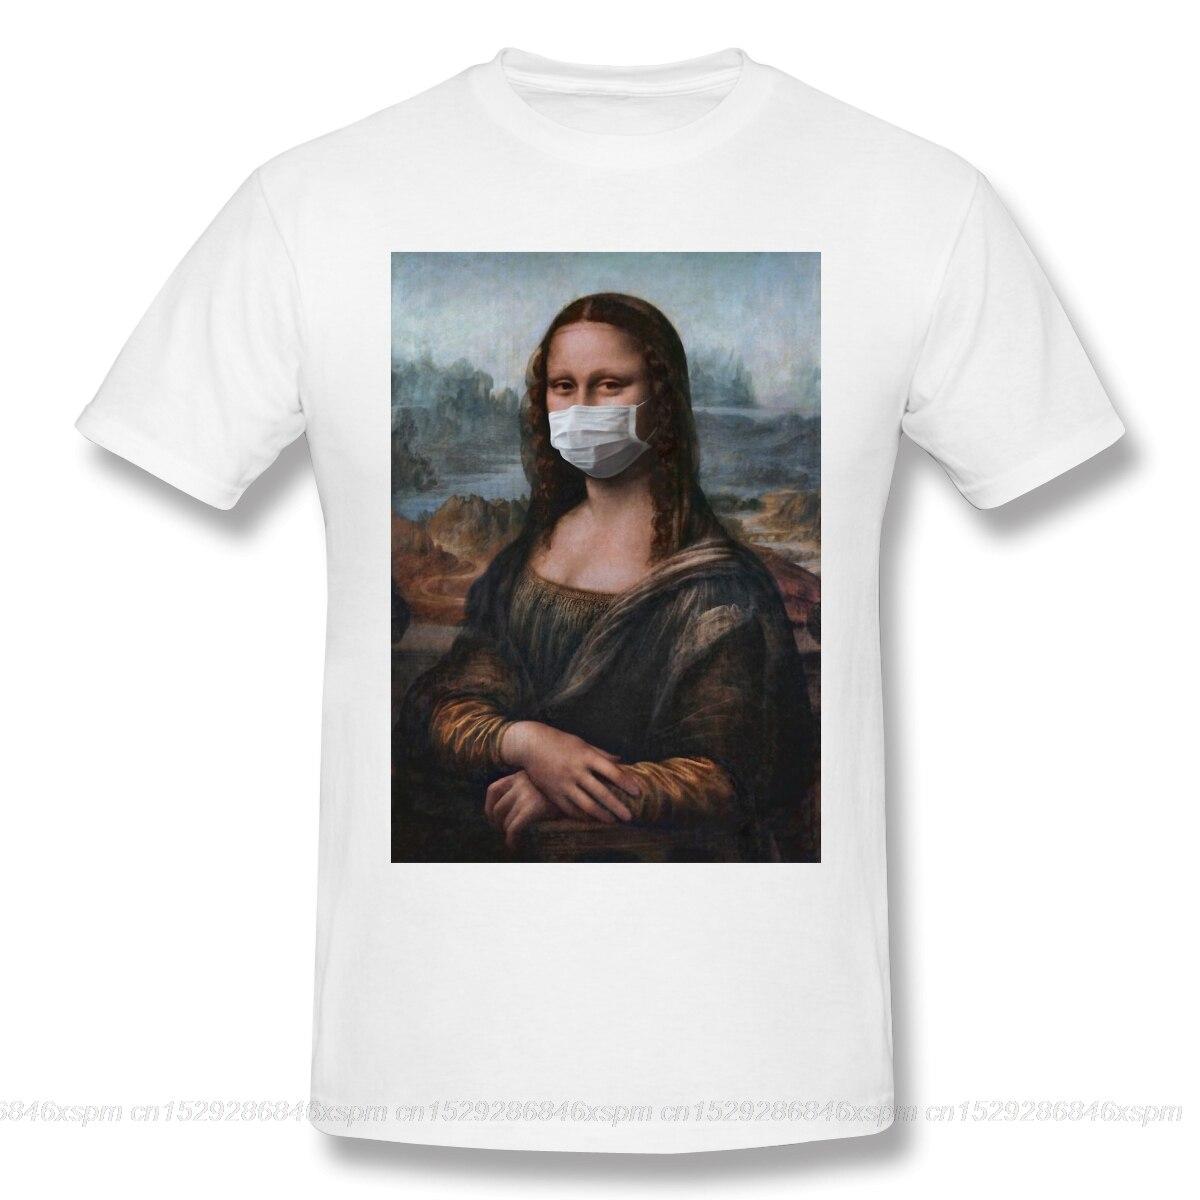 T-Shirts for Men Mona Lisa Funny monalisa mask Crewneck Cotton Graphic T Shirt off white Short Sleeve Tees Printed(China)